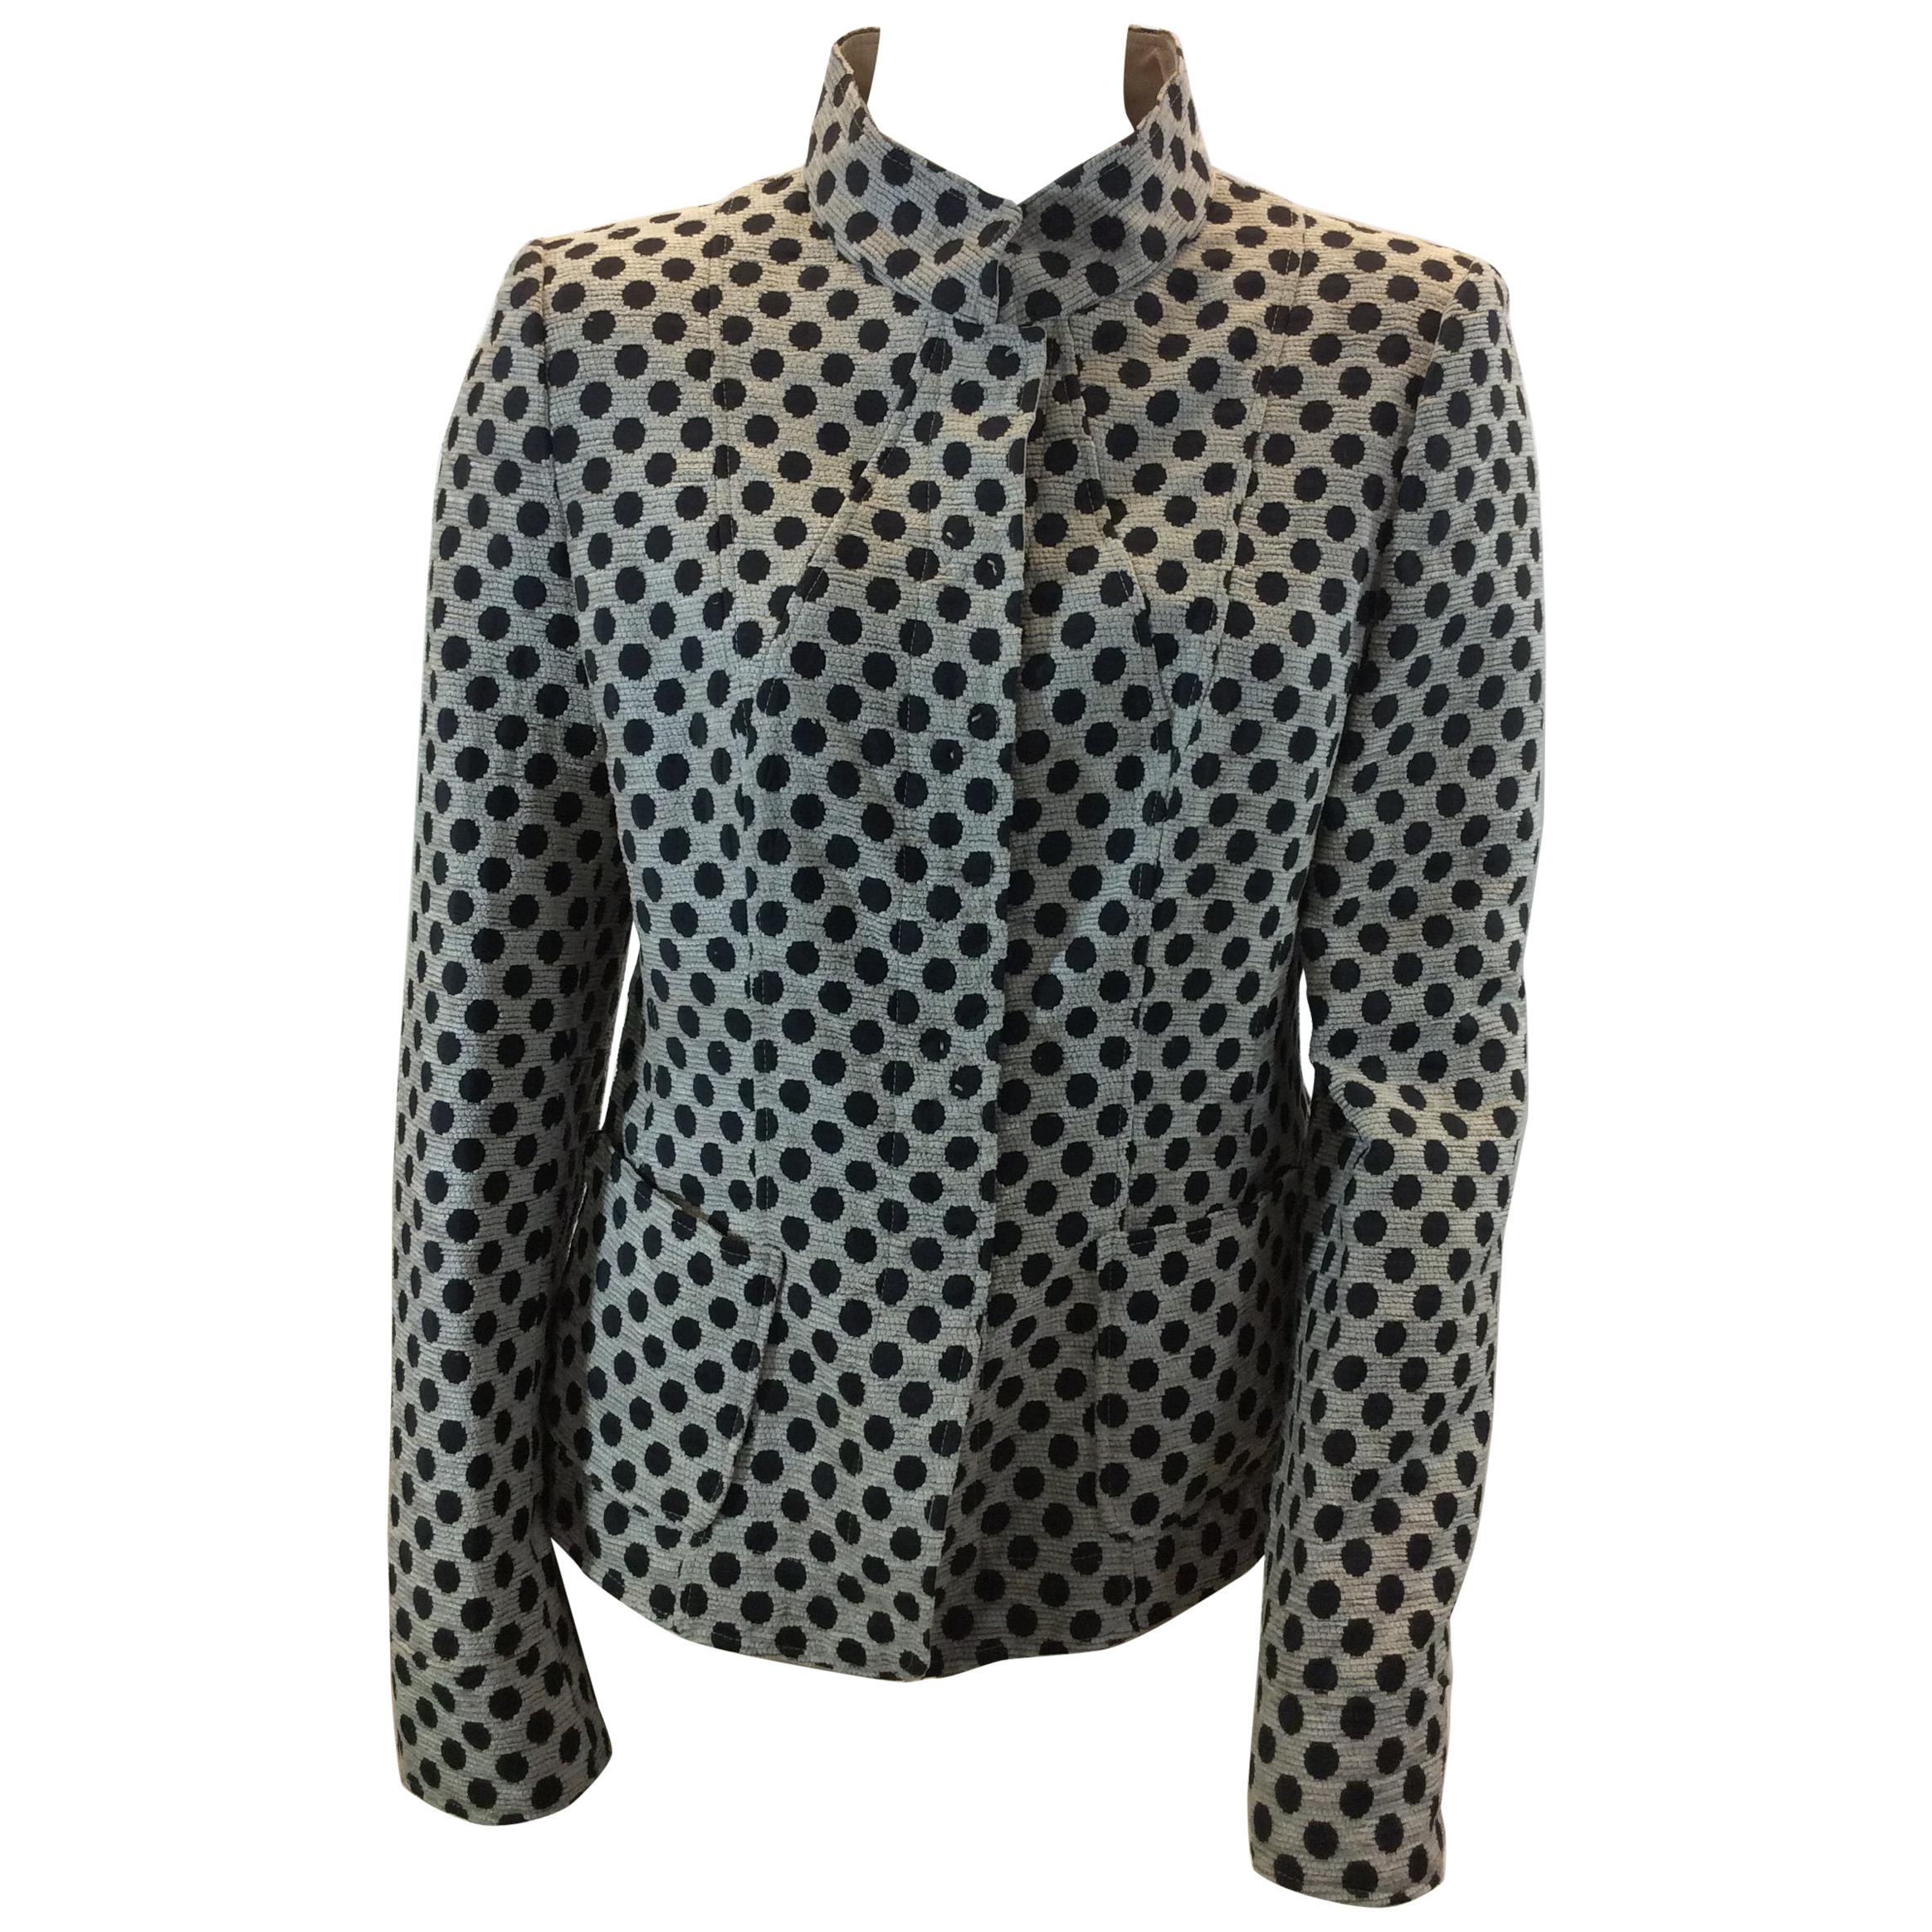 346166bbac7c4 Armani Collezioni Black and White Polka Dot Jacket For Sale at 1stdibs